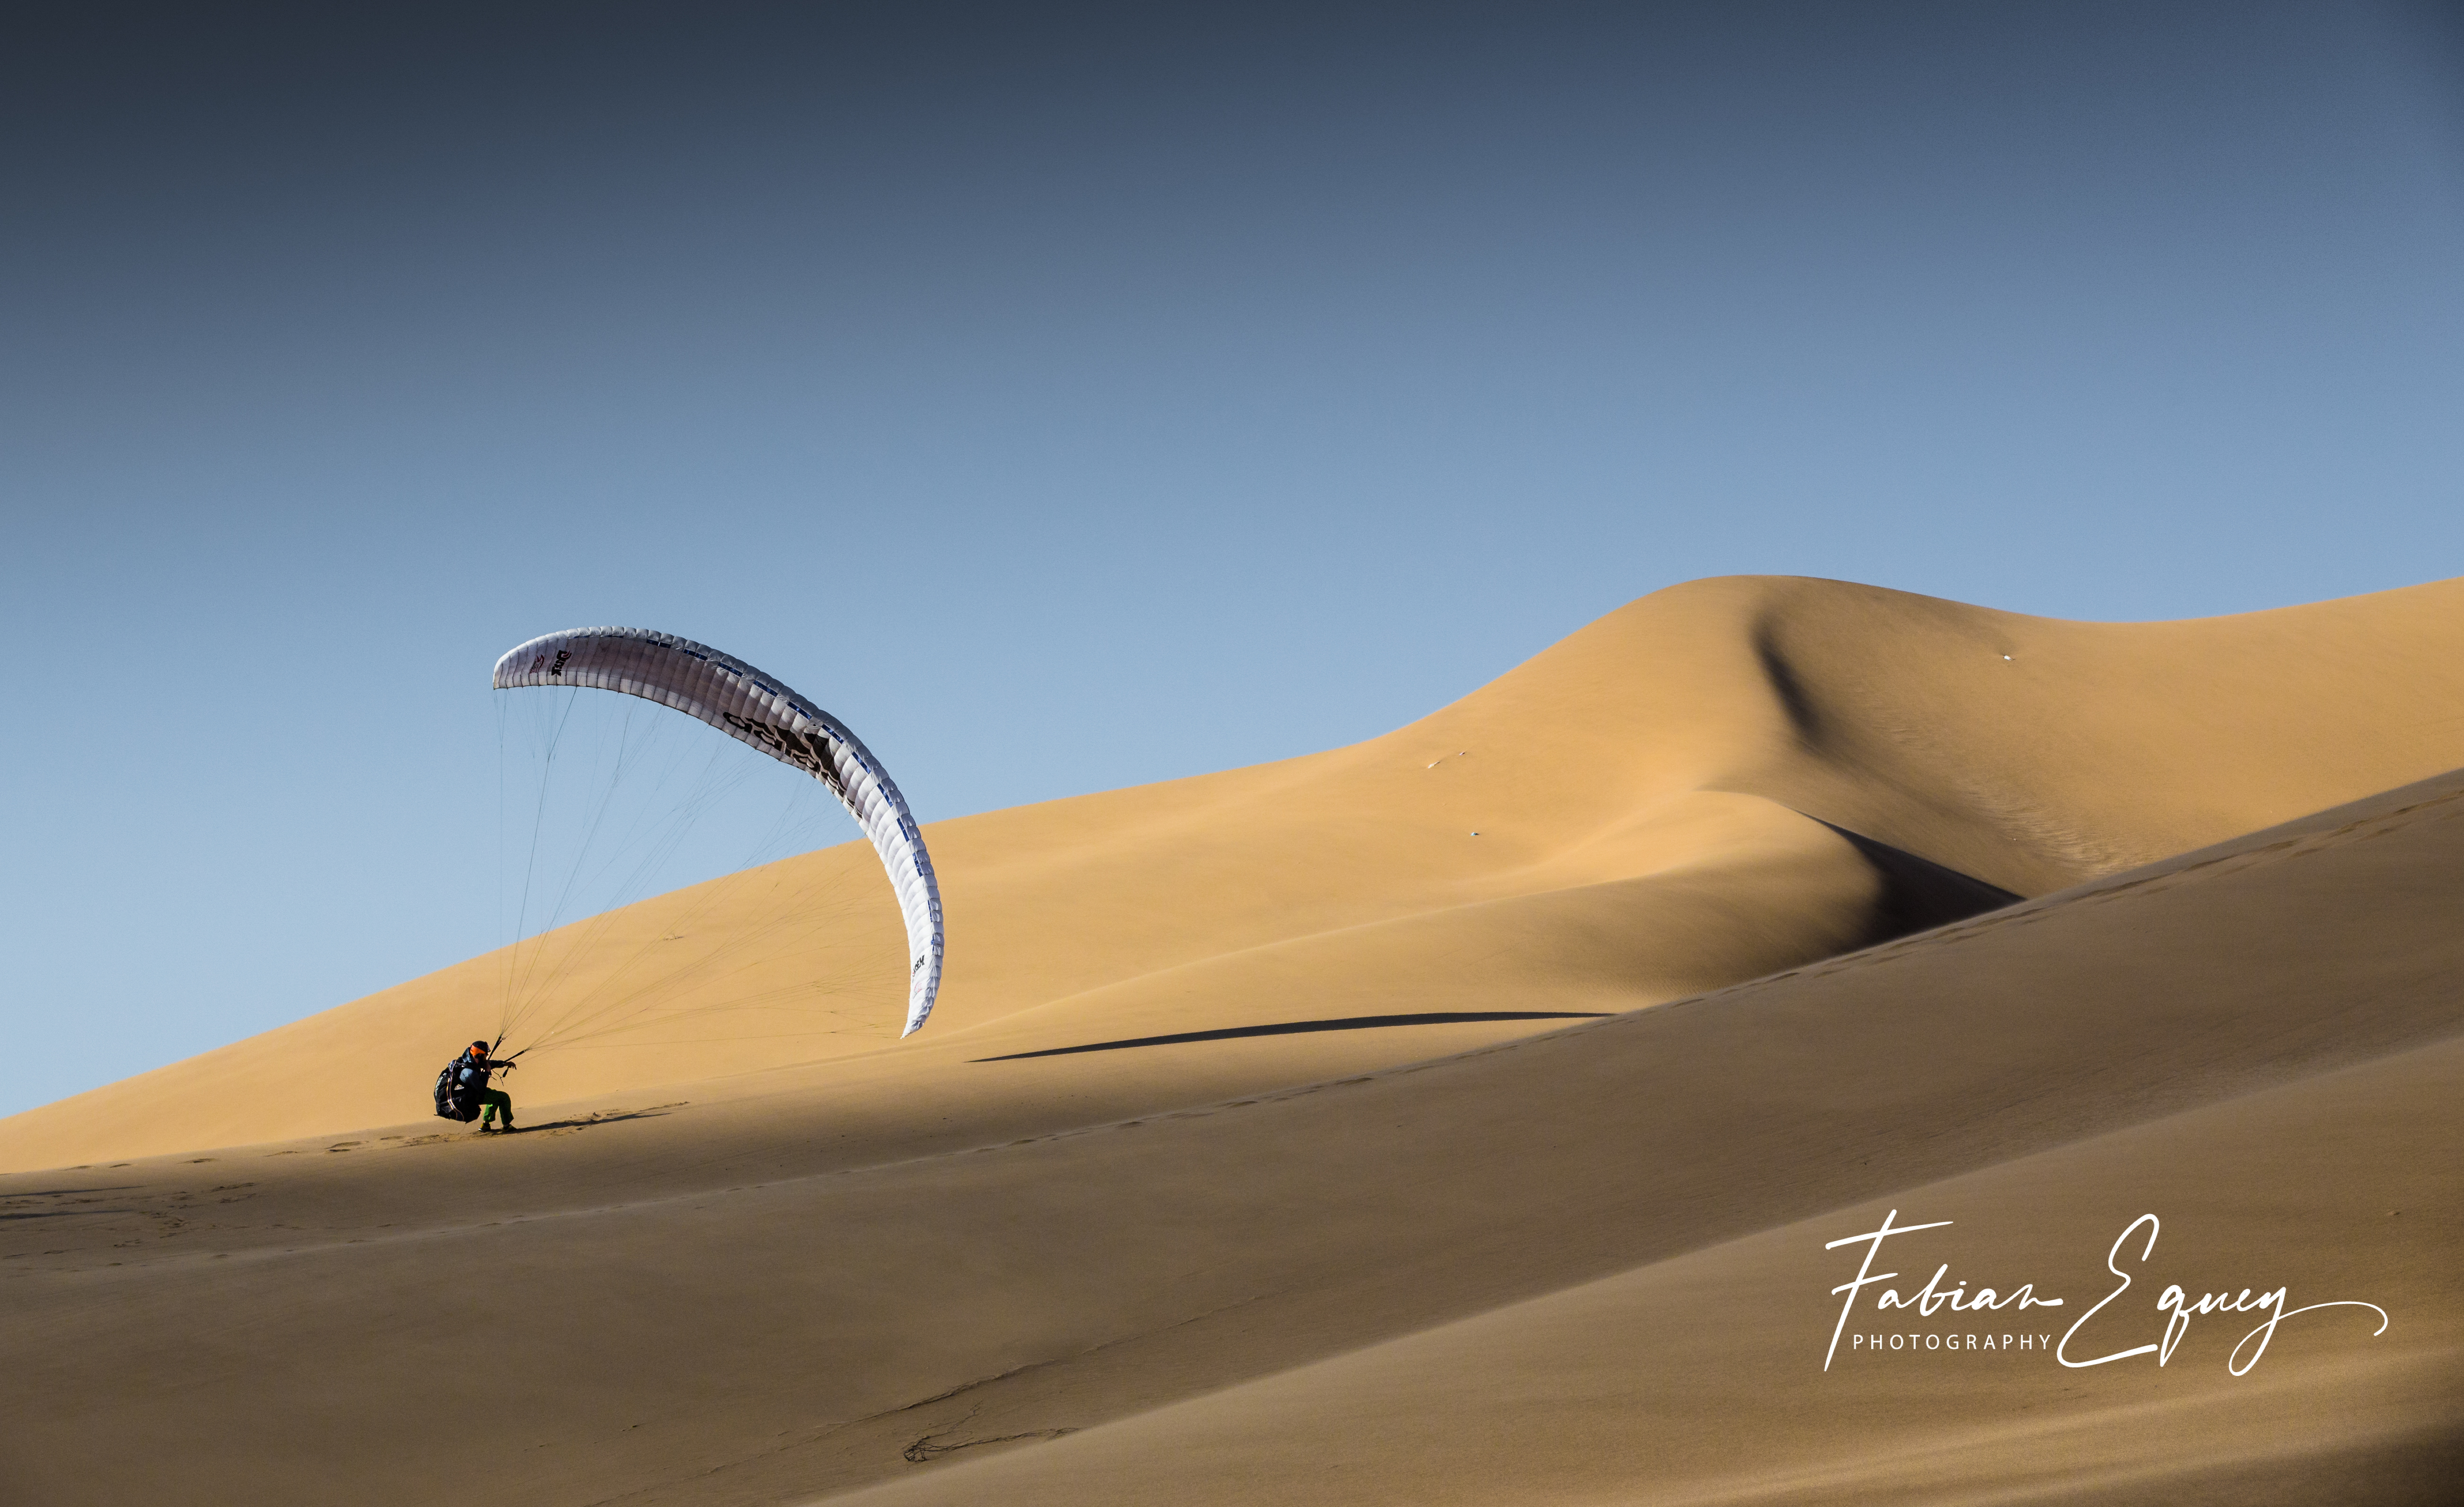 JB Chandelier, Namibia.